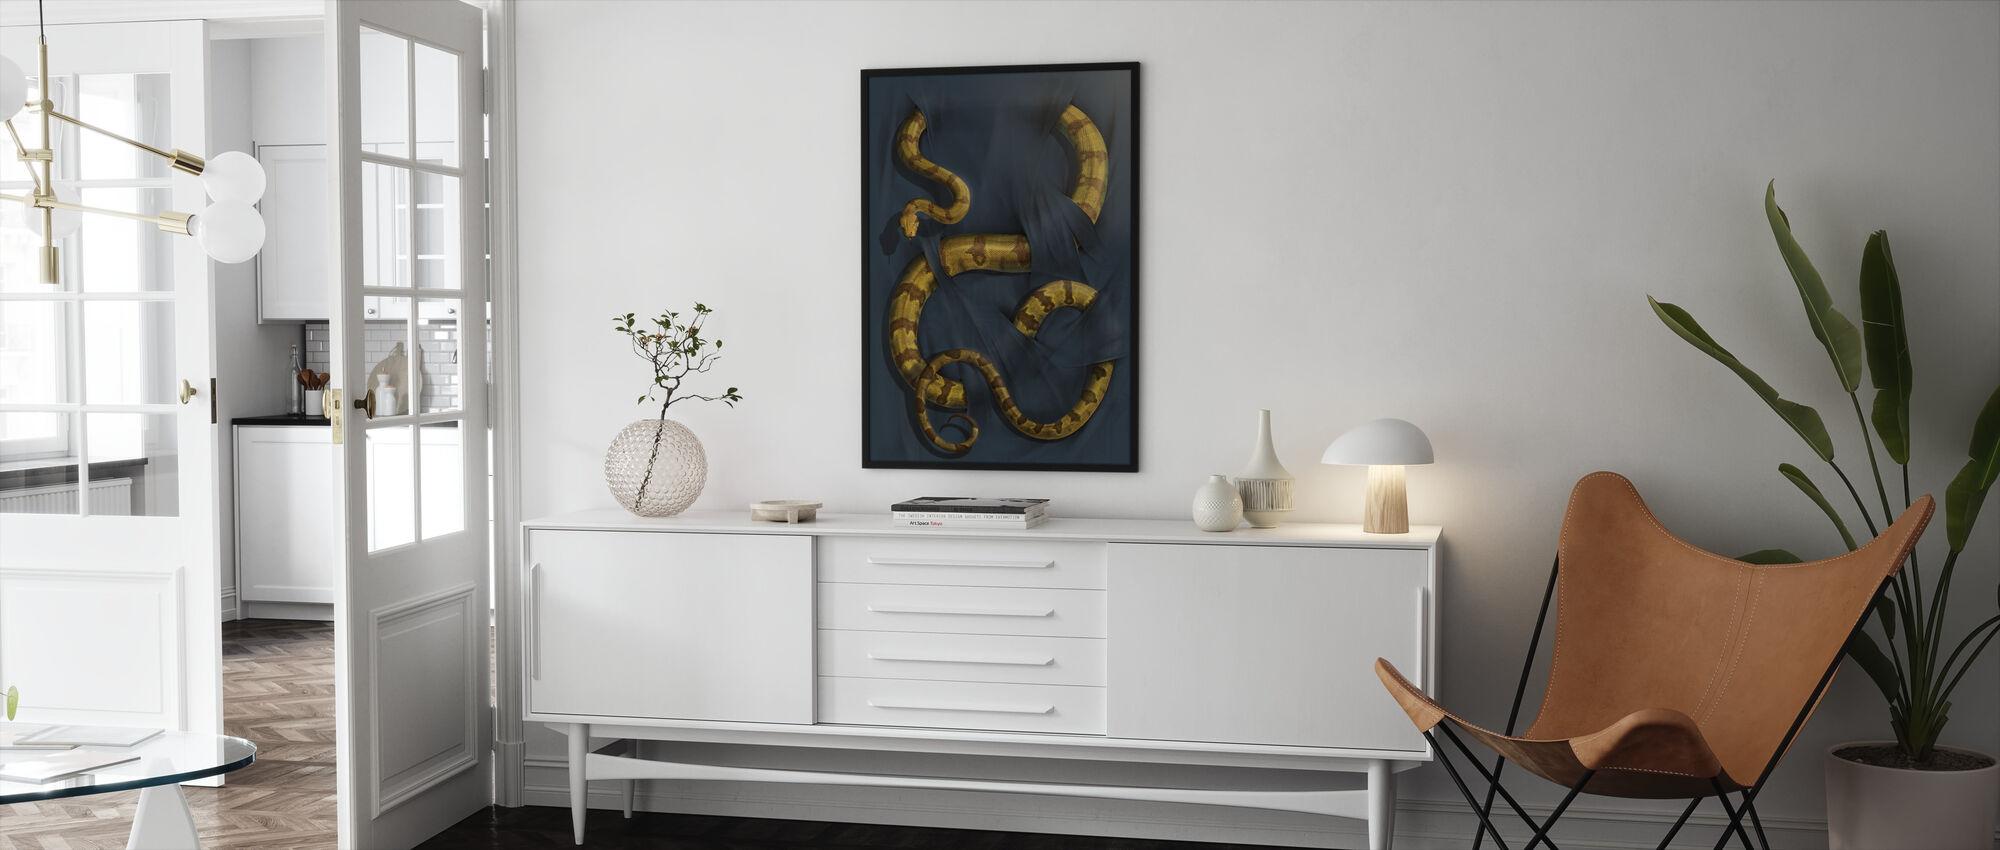 Boa Constrictor - Innrammet bilde - Stue